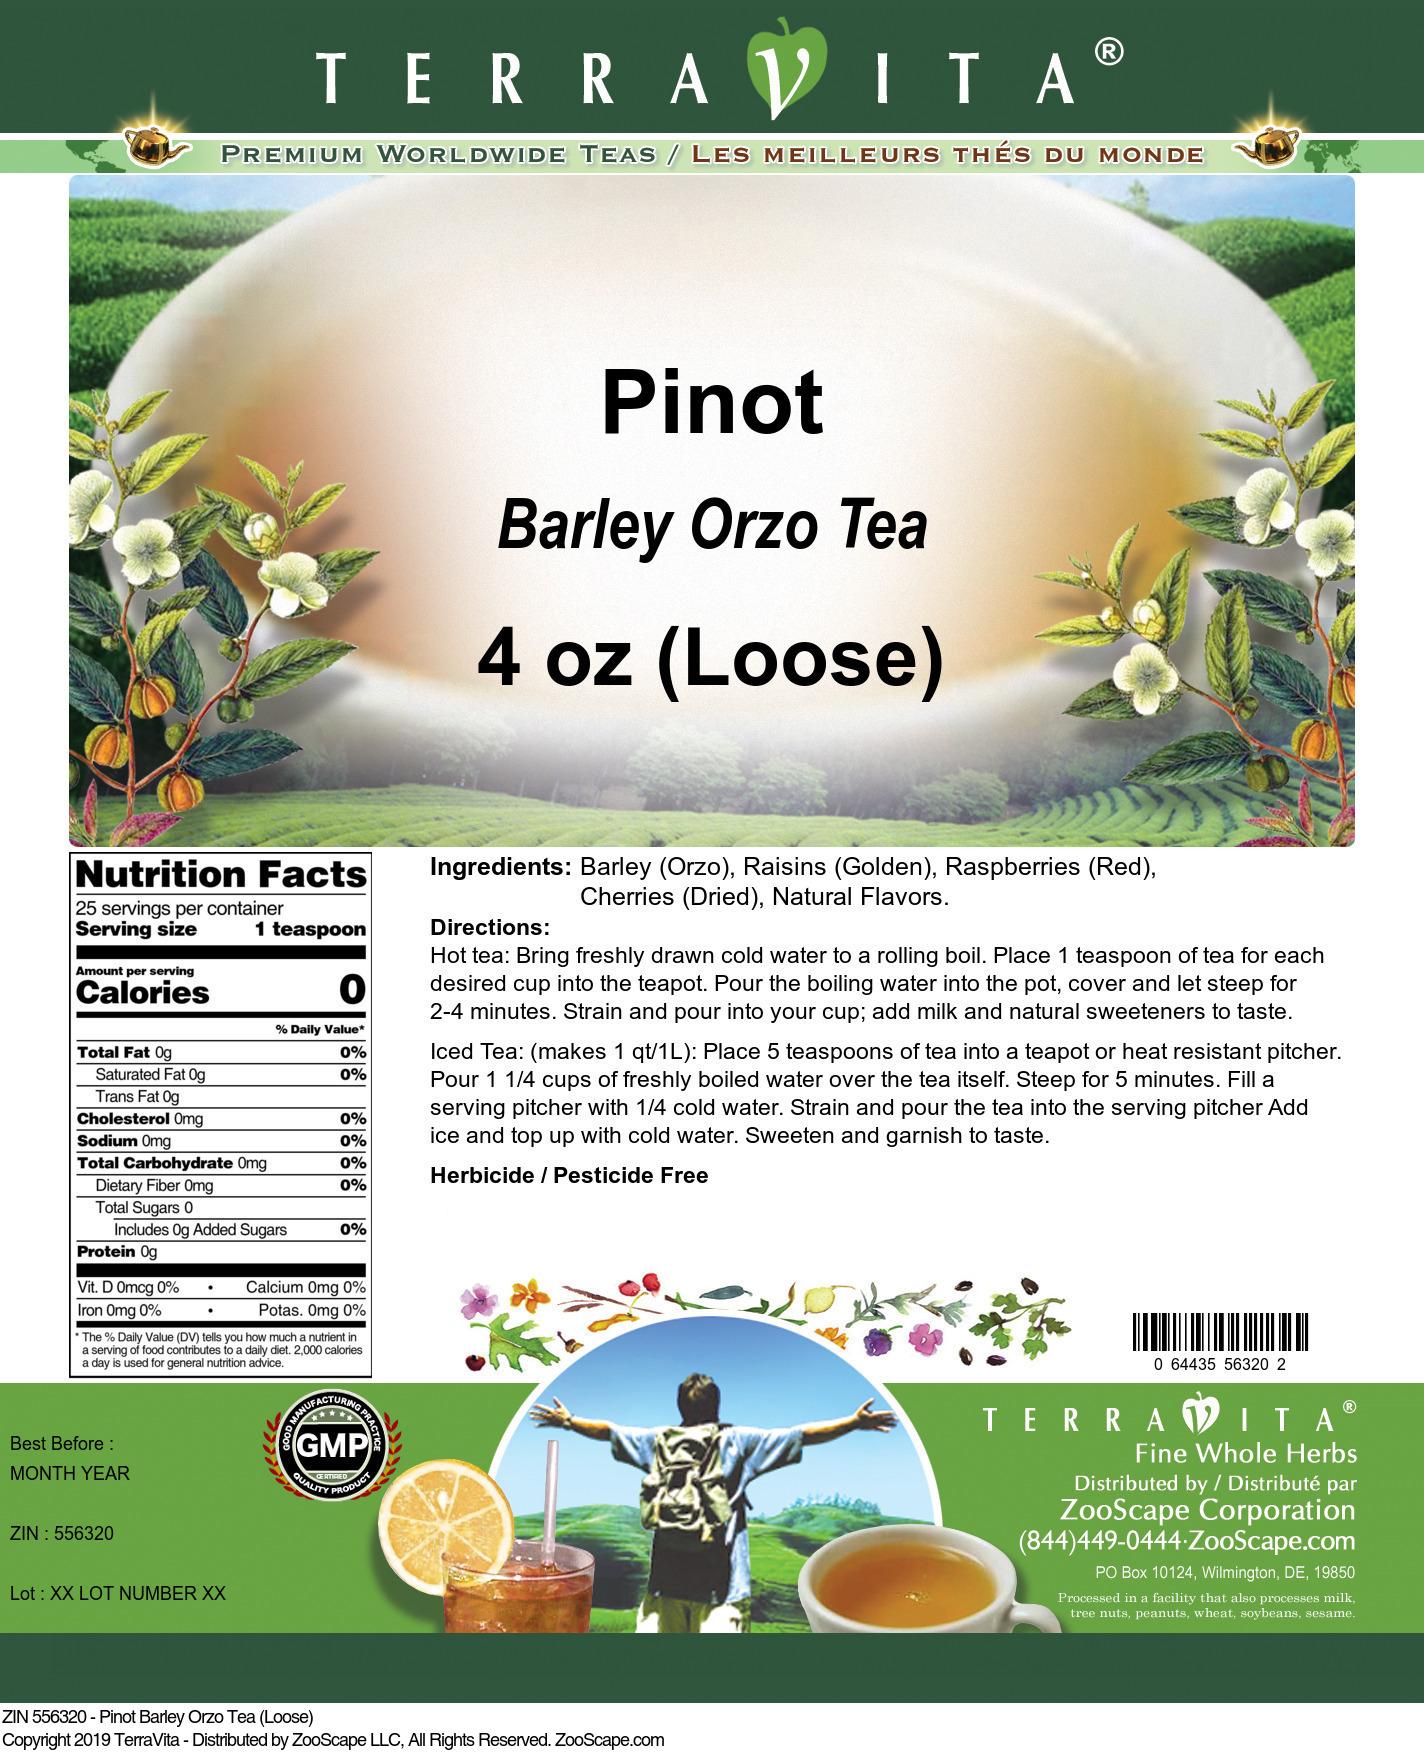 Pinot Barley Orzo Tea (Loose)